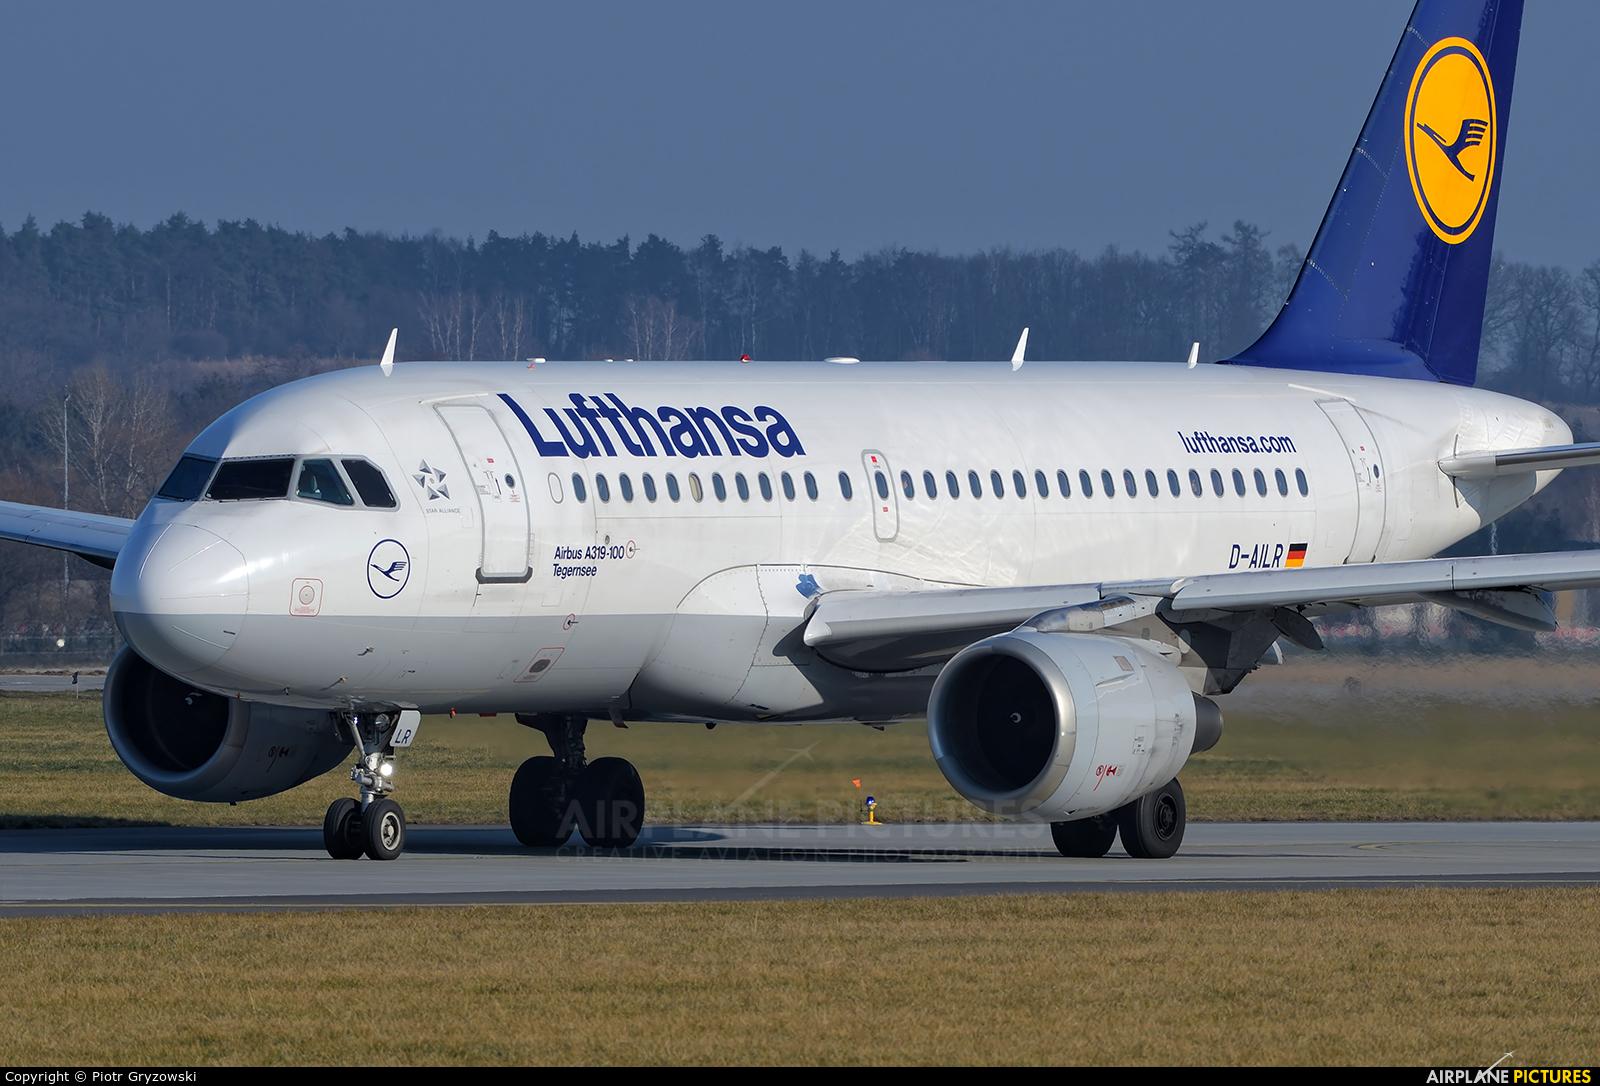 Lufthansa D-AILR aircraft at Kraków - John Paul II Intl